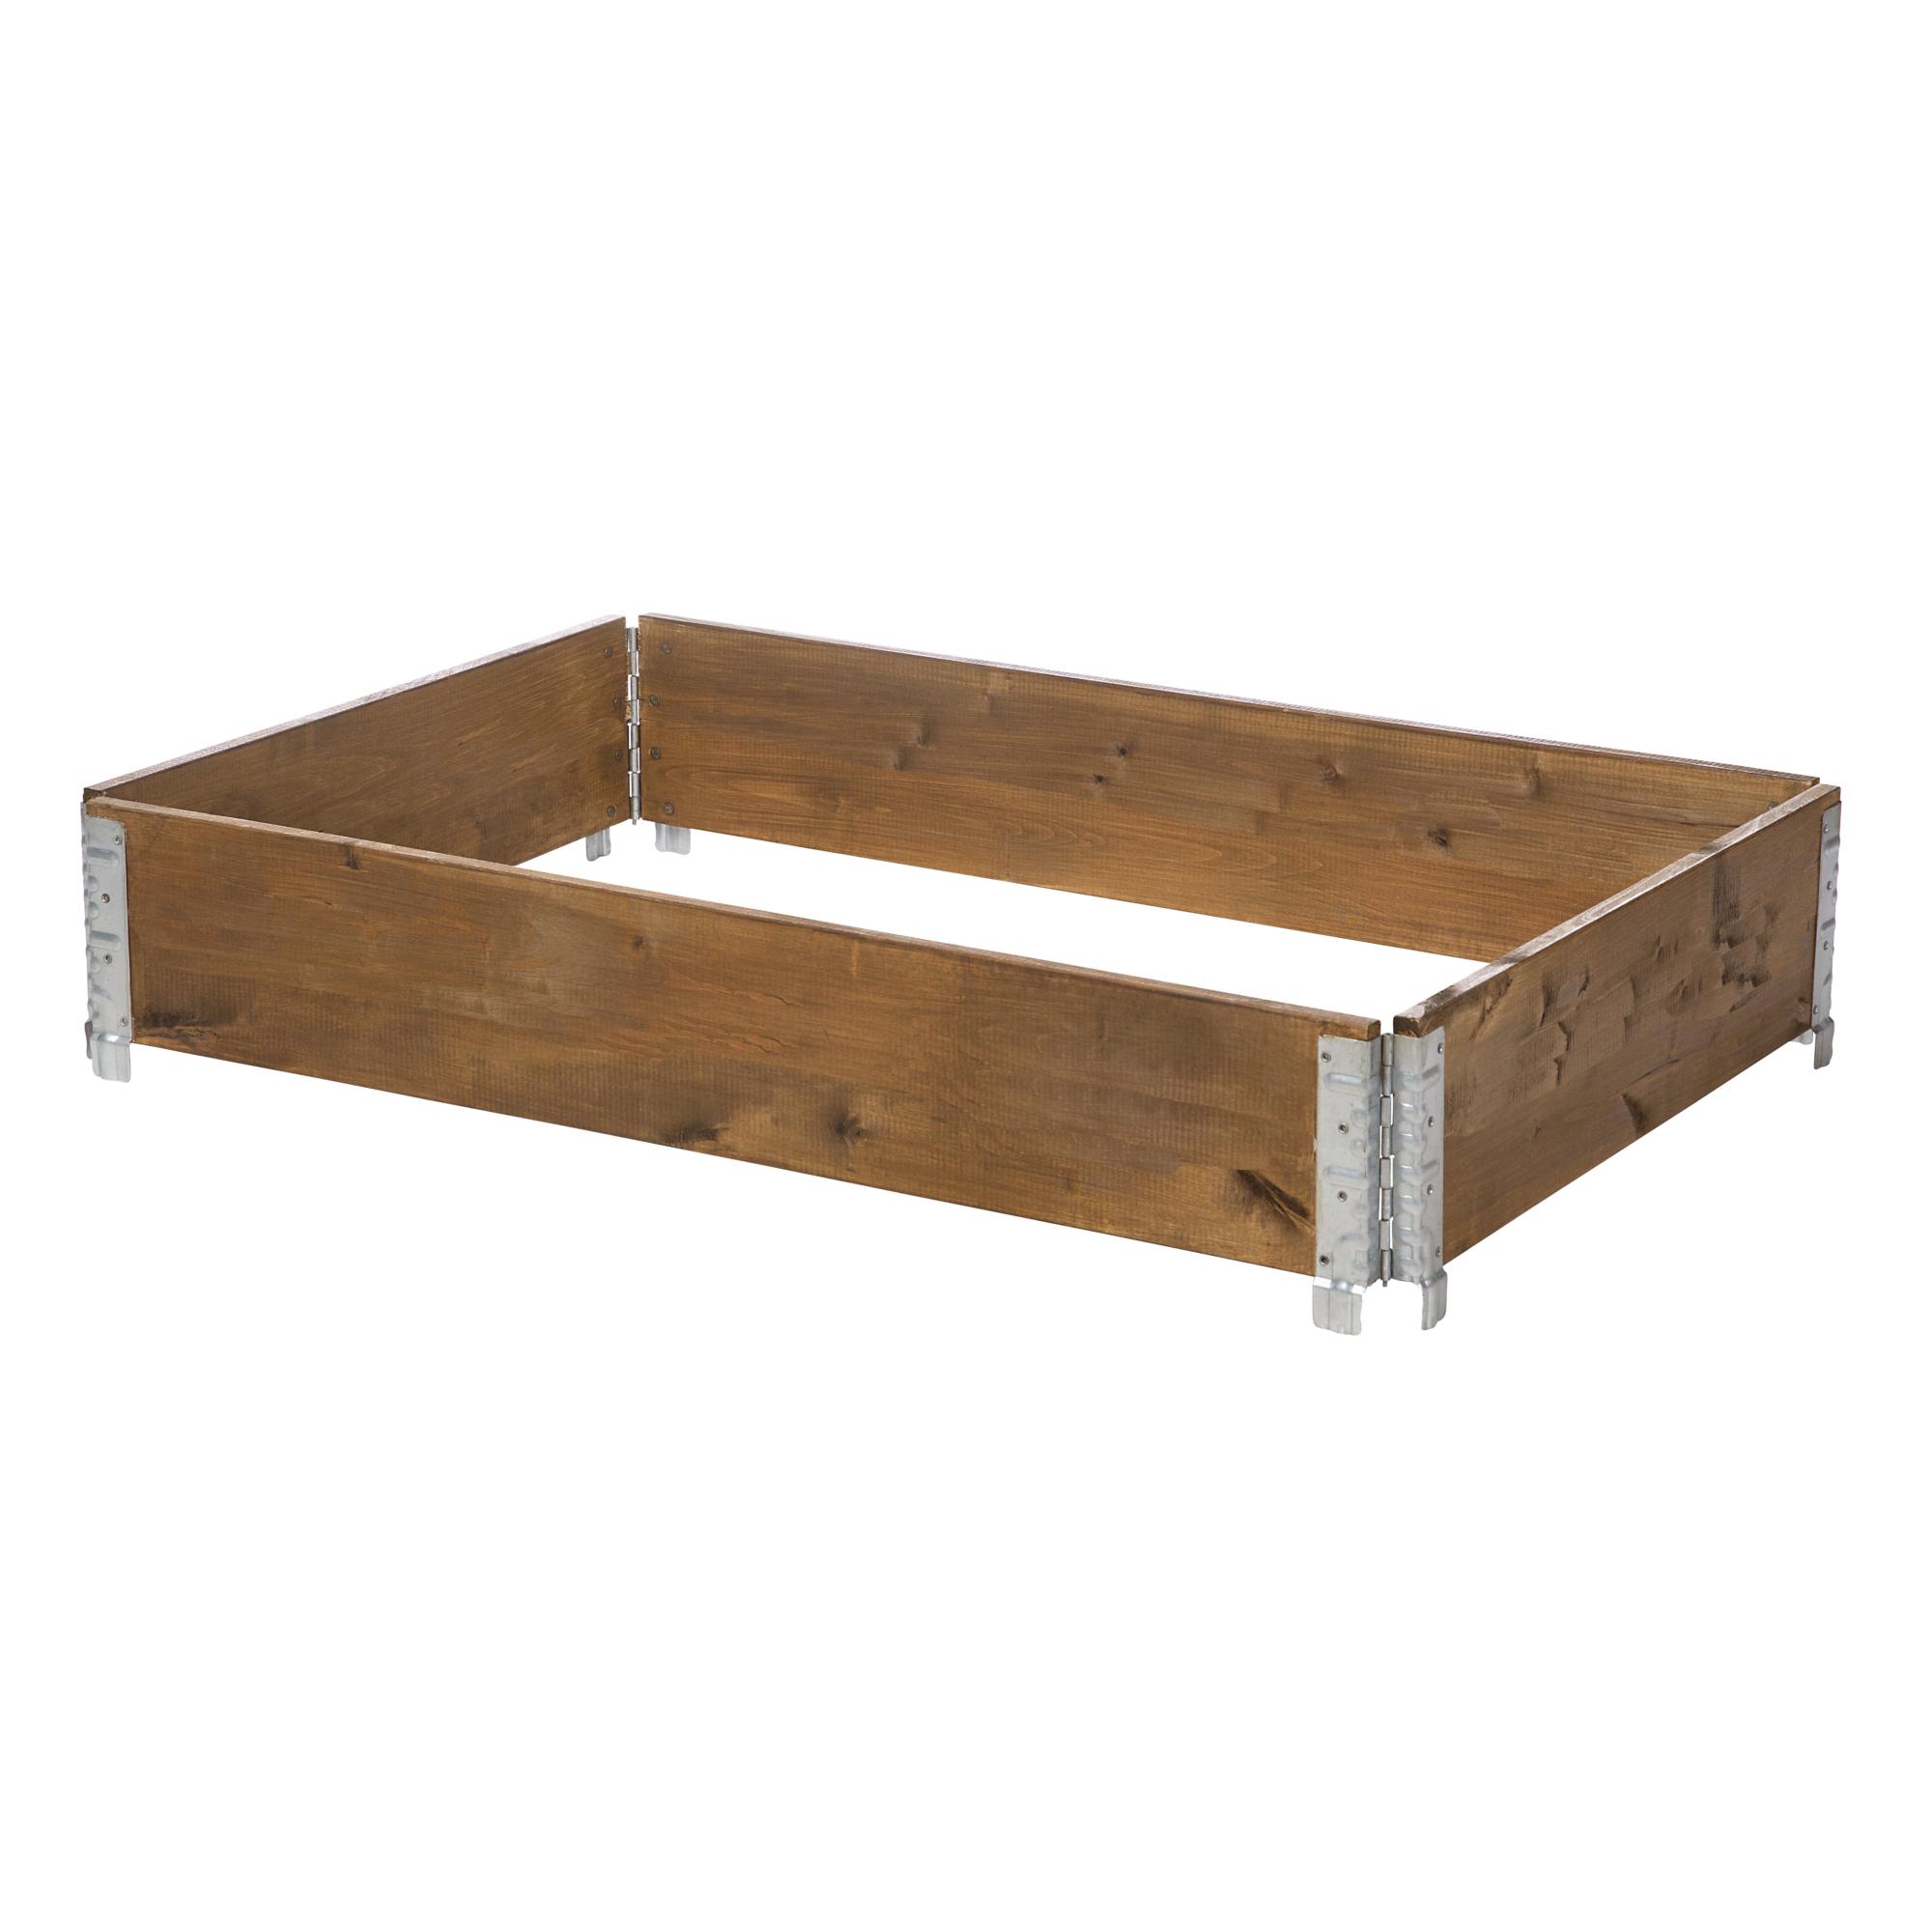 Holzbeet Linda 120 X 80 Cm Braun ǀ Toom Baumarkt